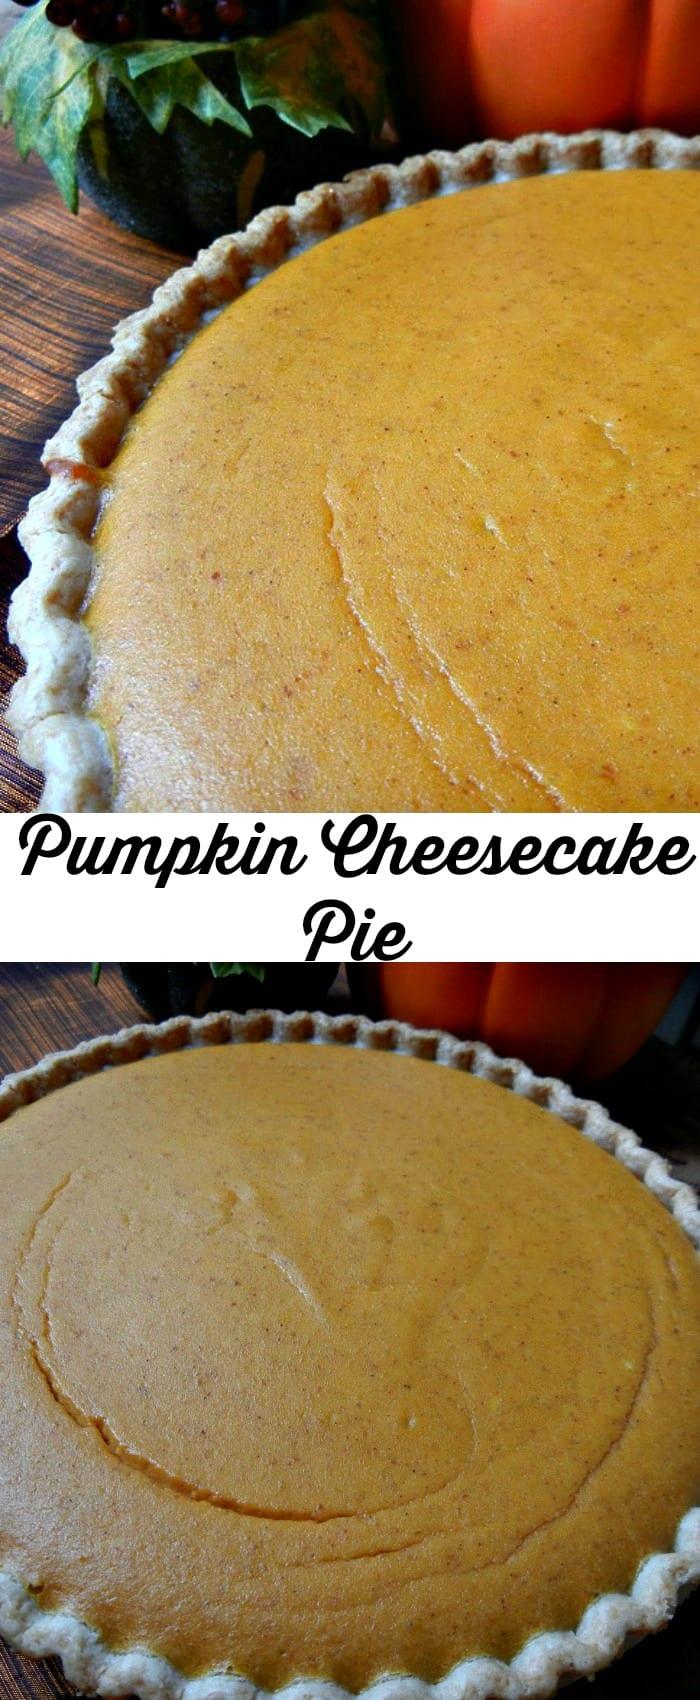 Pumpkin Cheesecake Pie from willcookforsmiles.com #pumpkin #dessert #holiday